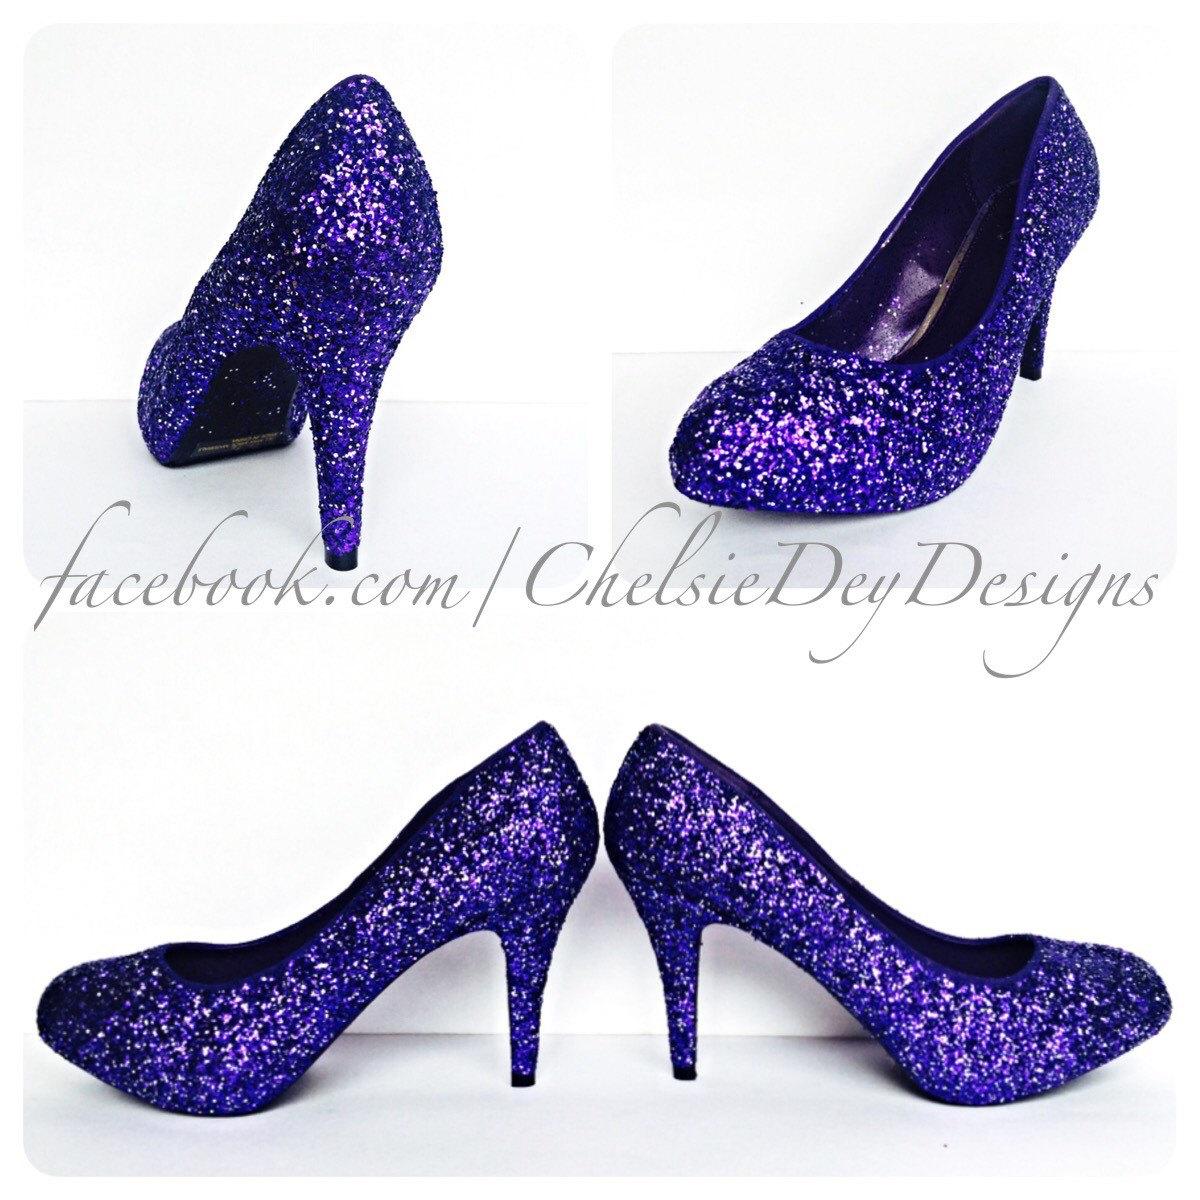 a90da7a7c874 Purple   Silver Glitter Low Heels - Eggplant Royal Purple Pumps ...